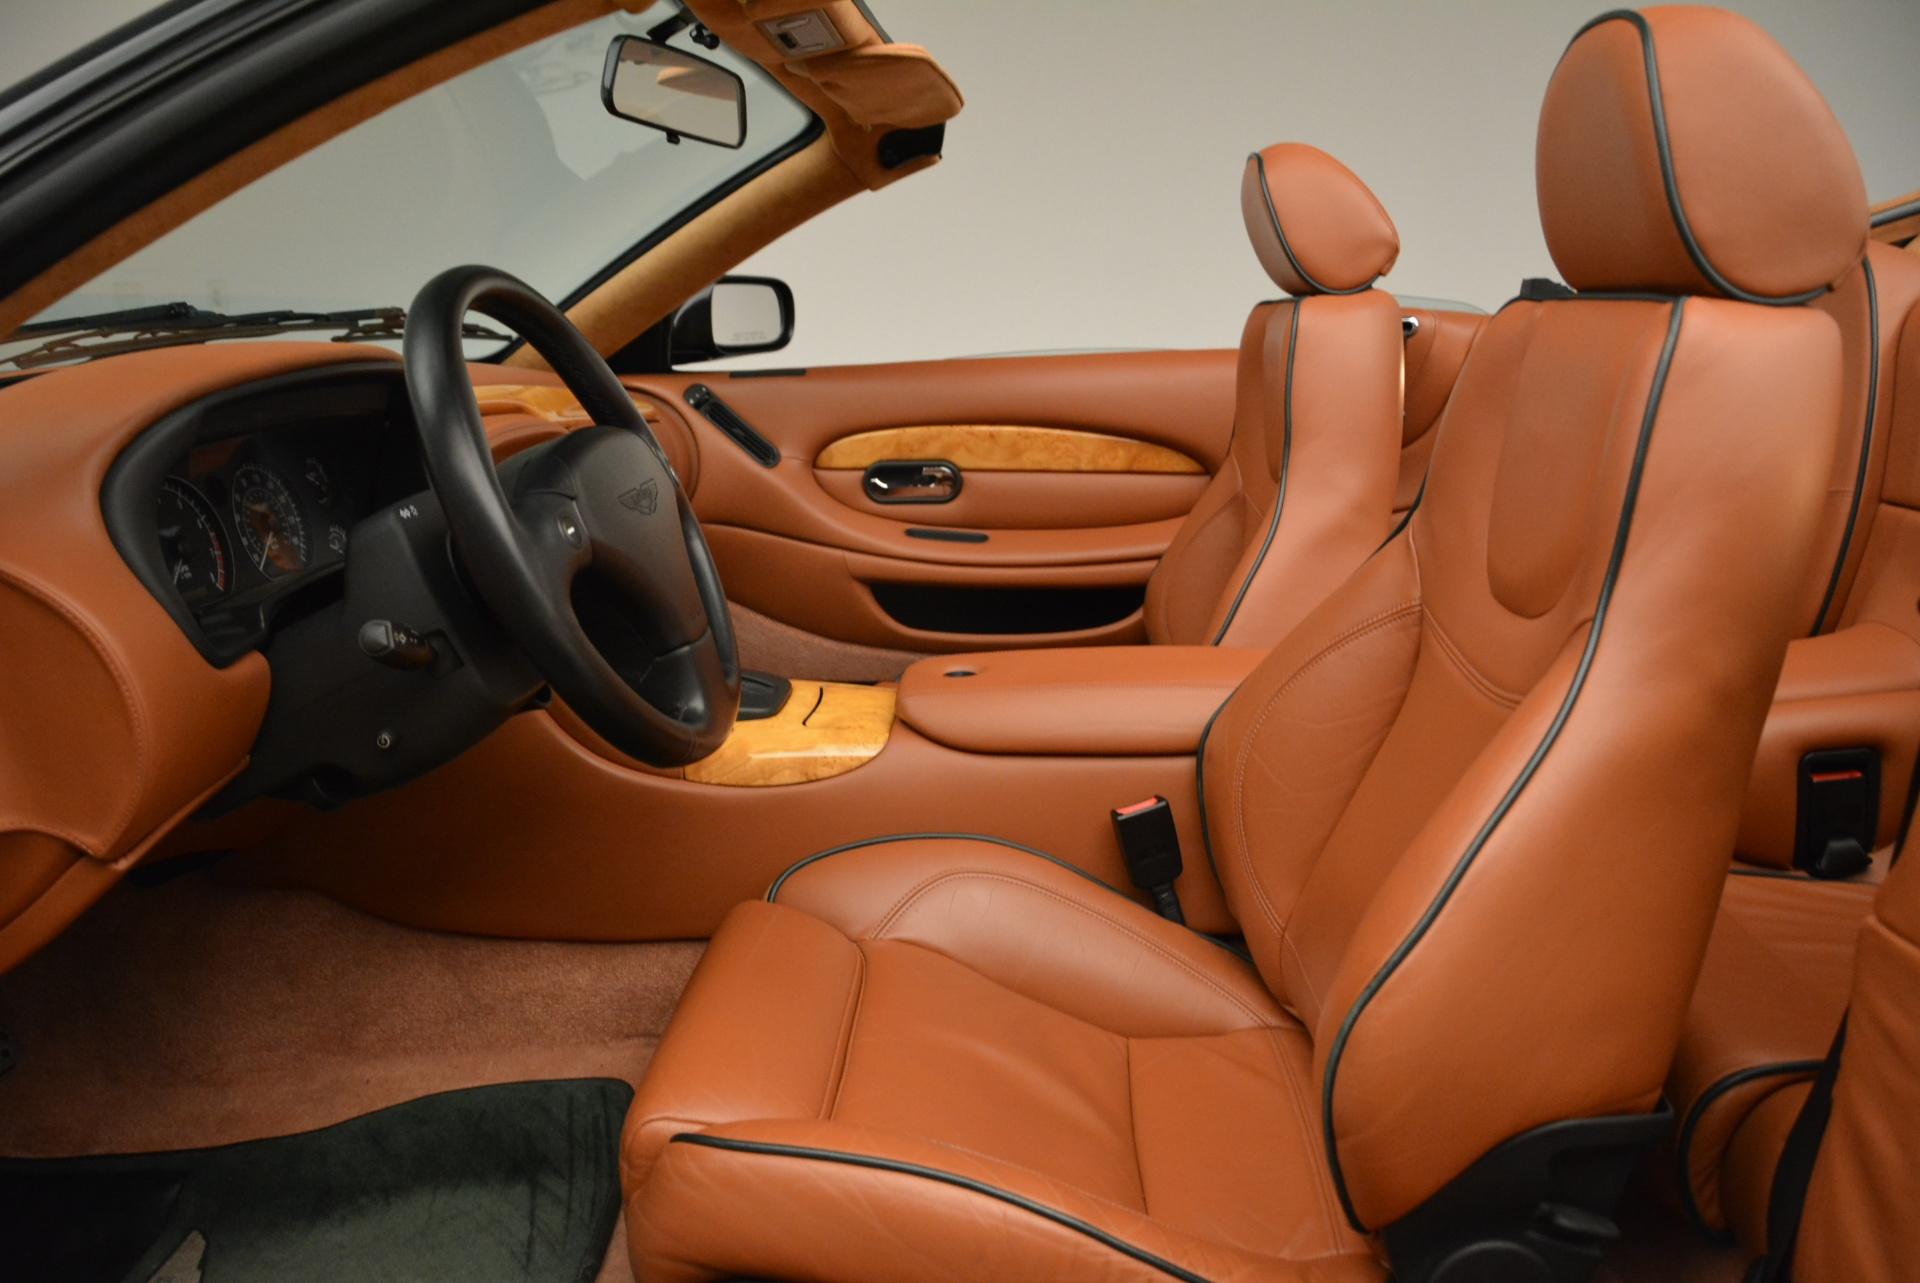 Used 2003 Aston Martin DB7 Vantage Volante For Sale In Westport, CT 2084_p23